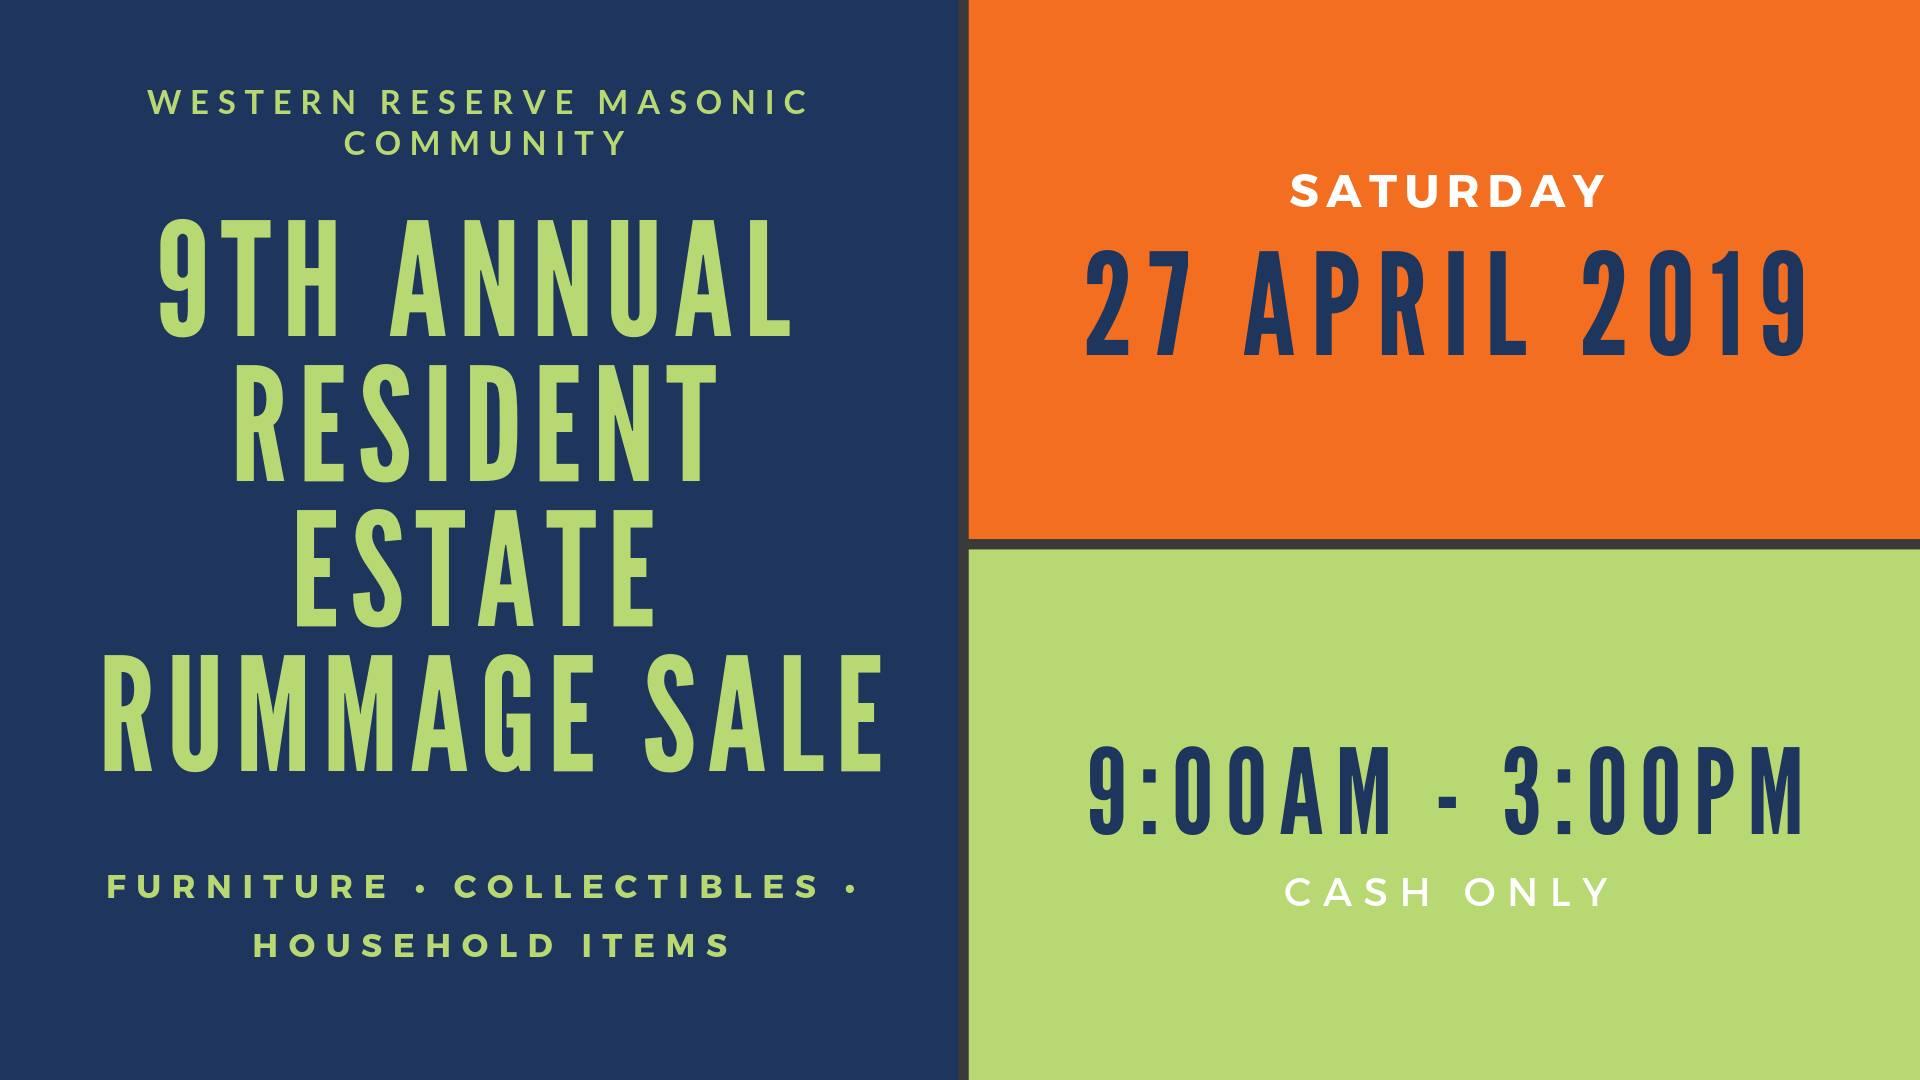 Annual Rummage Sale in Medina on April 27